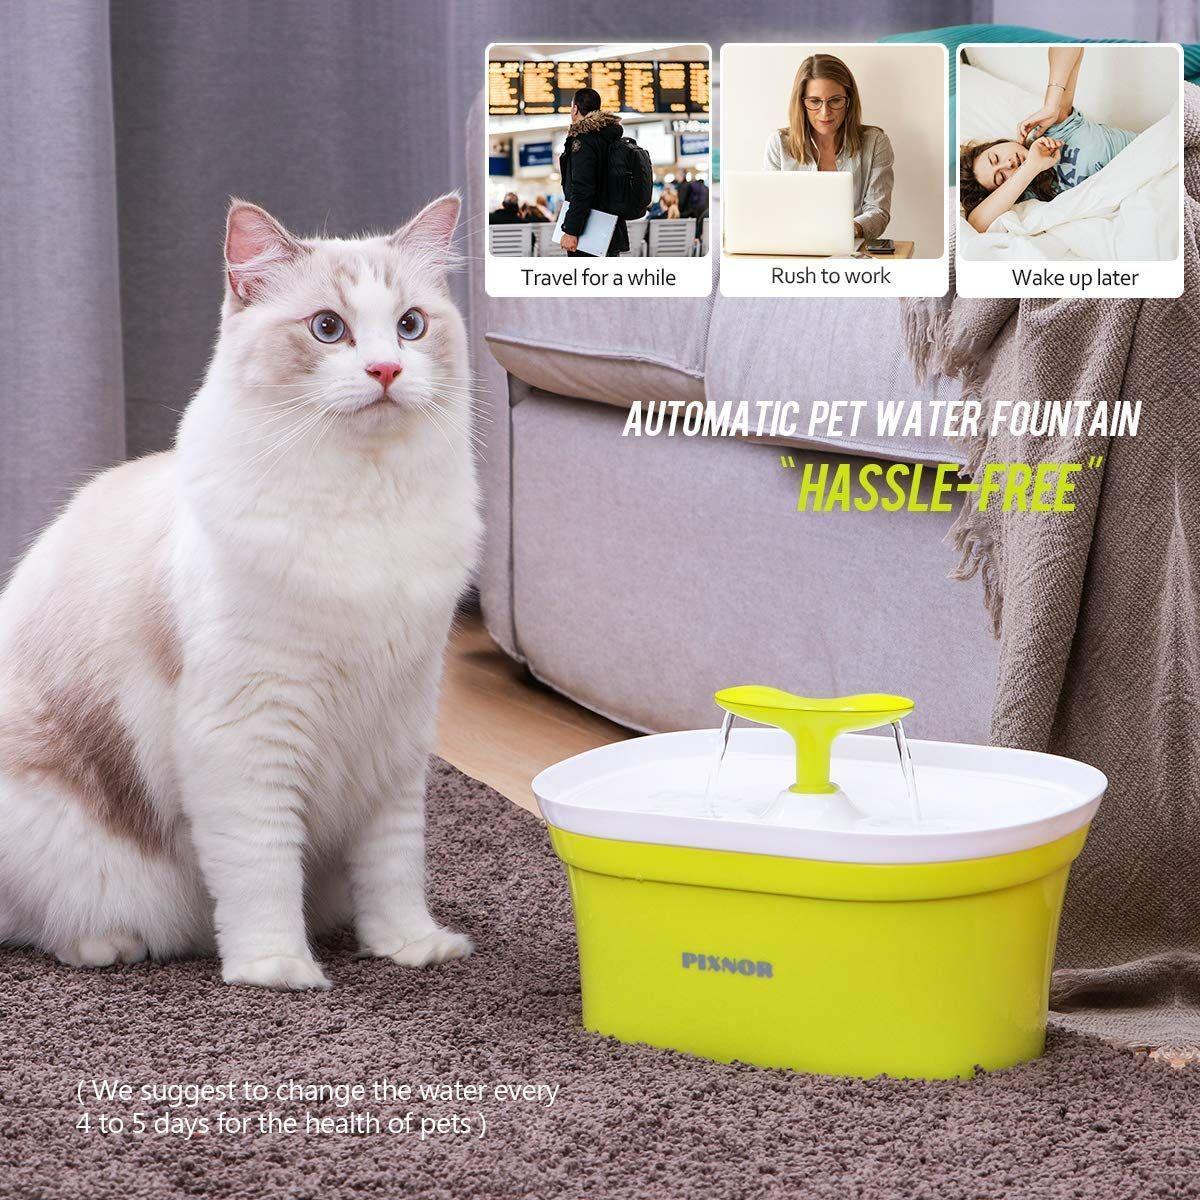 Pixnor Pet Fountain 95oz 2 8l Automatic Cat Water Fountain Dog